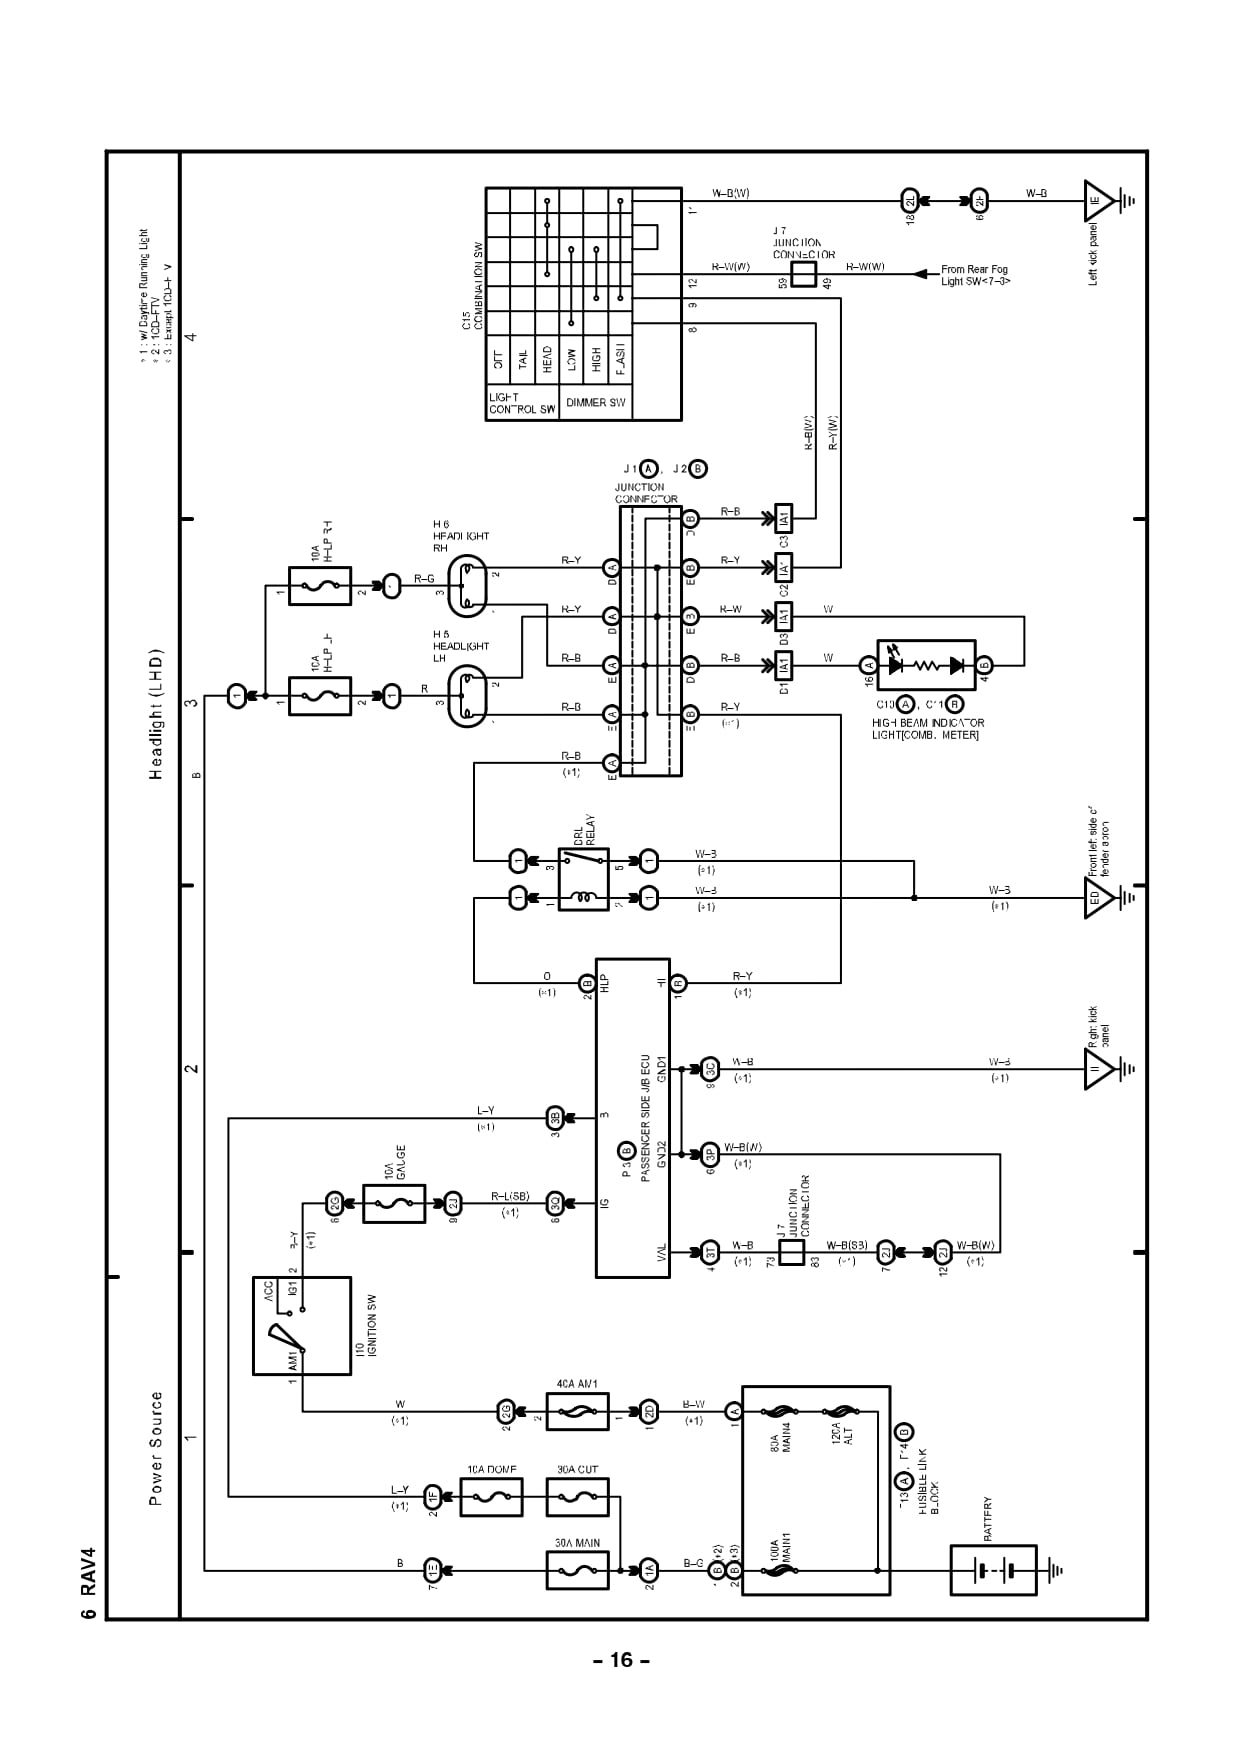 Diagram Rav4 Wiring Diagram Full Version Hd Quality